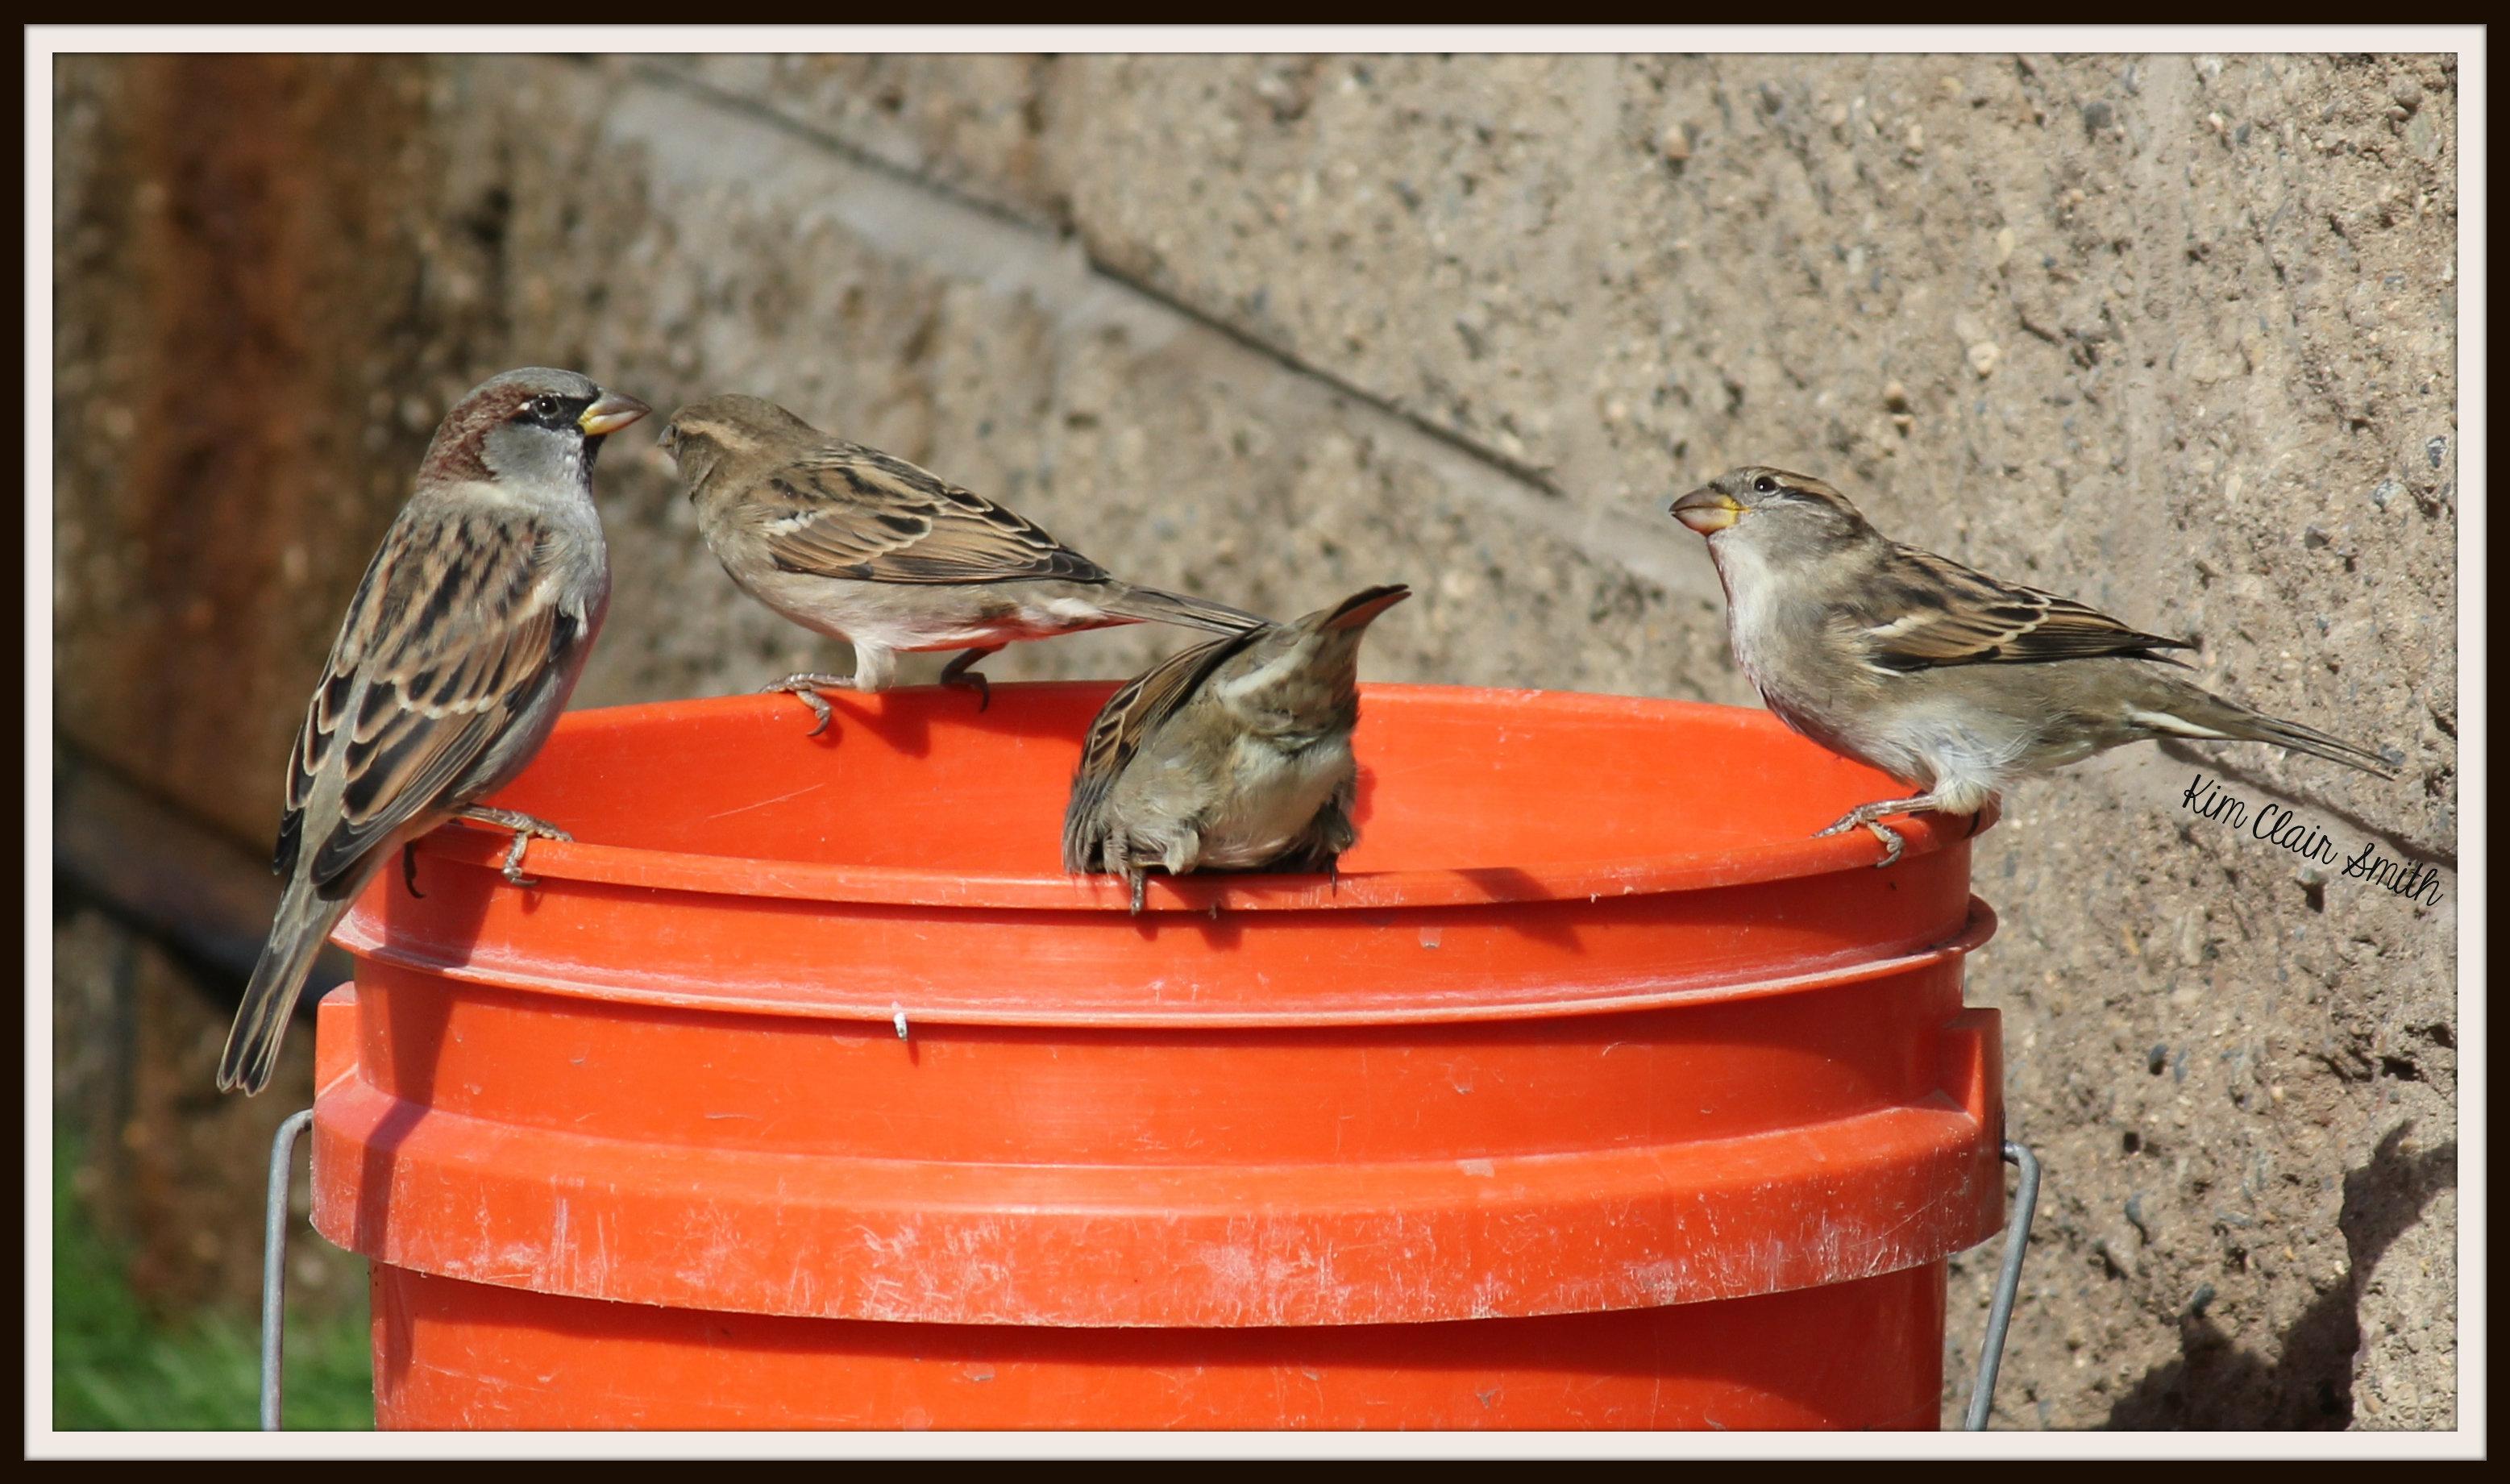 house sparrows on orange bucket at dog park w sig